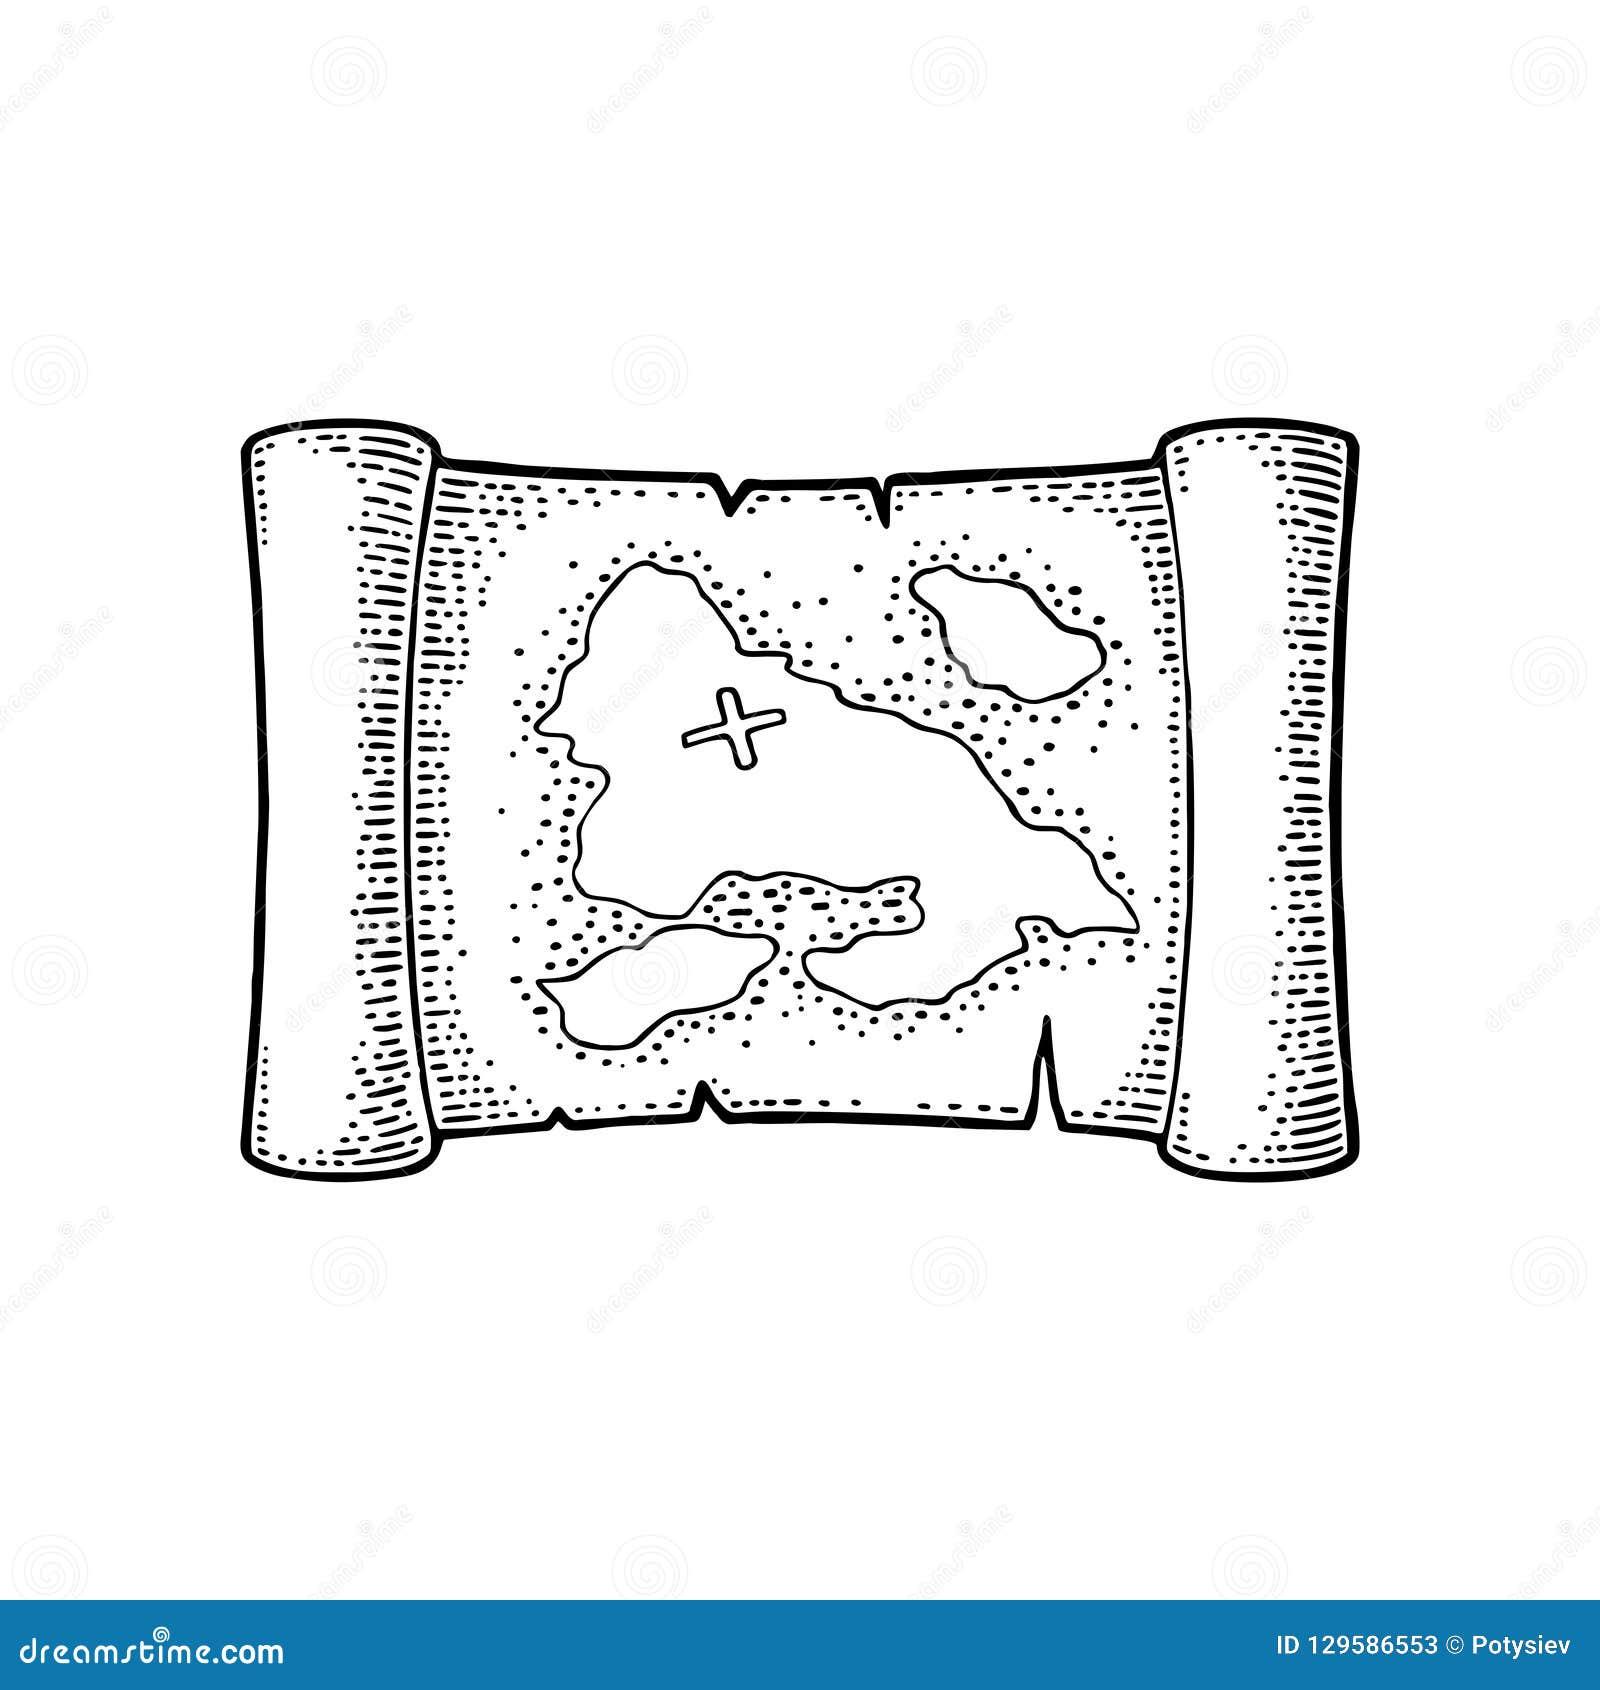 Carte Au Tresor Noir Et Blanc.Vieille Carte De Tresor De Pirate Illustration De Gravure De